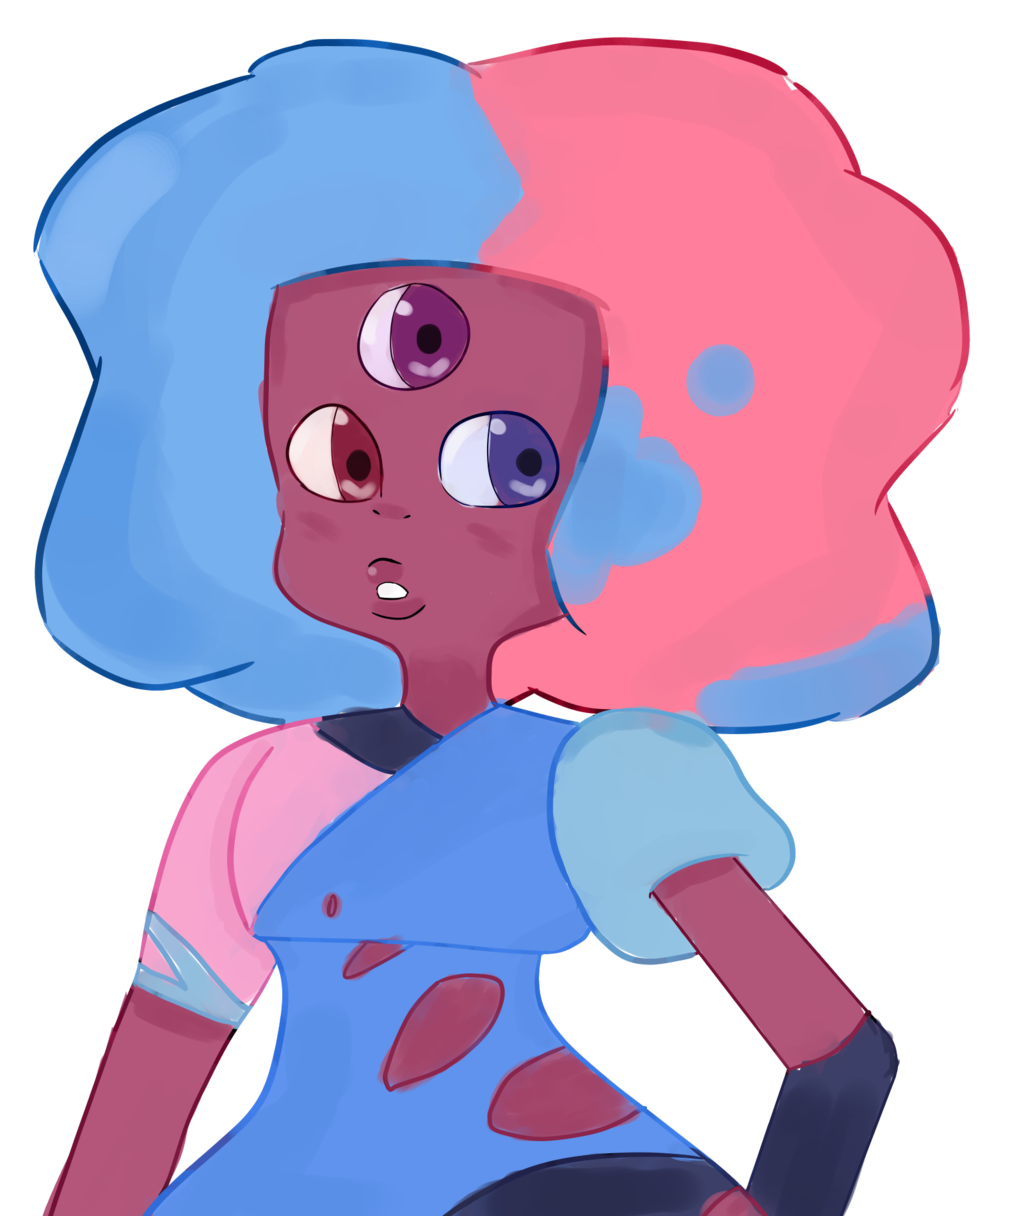 Cotton clipart pink blue cotton candy. Garnet by pixelmiayu on